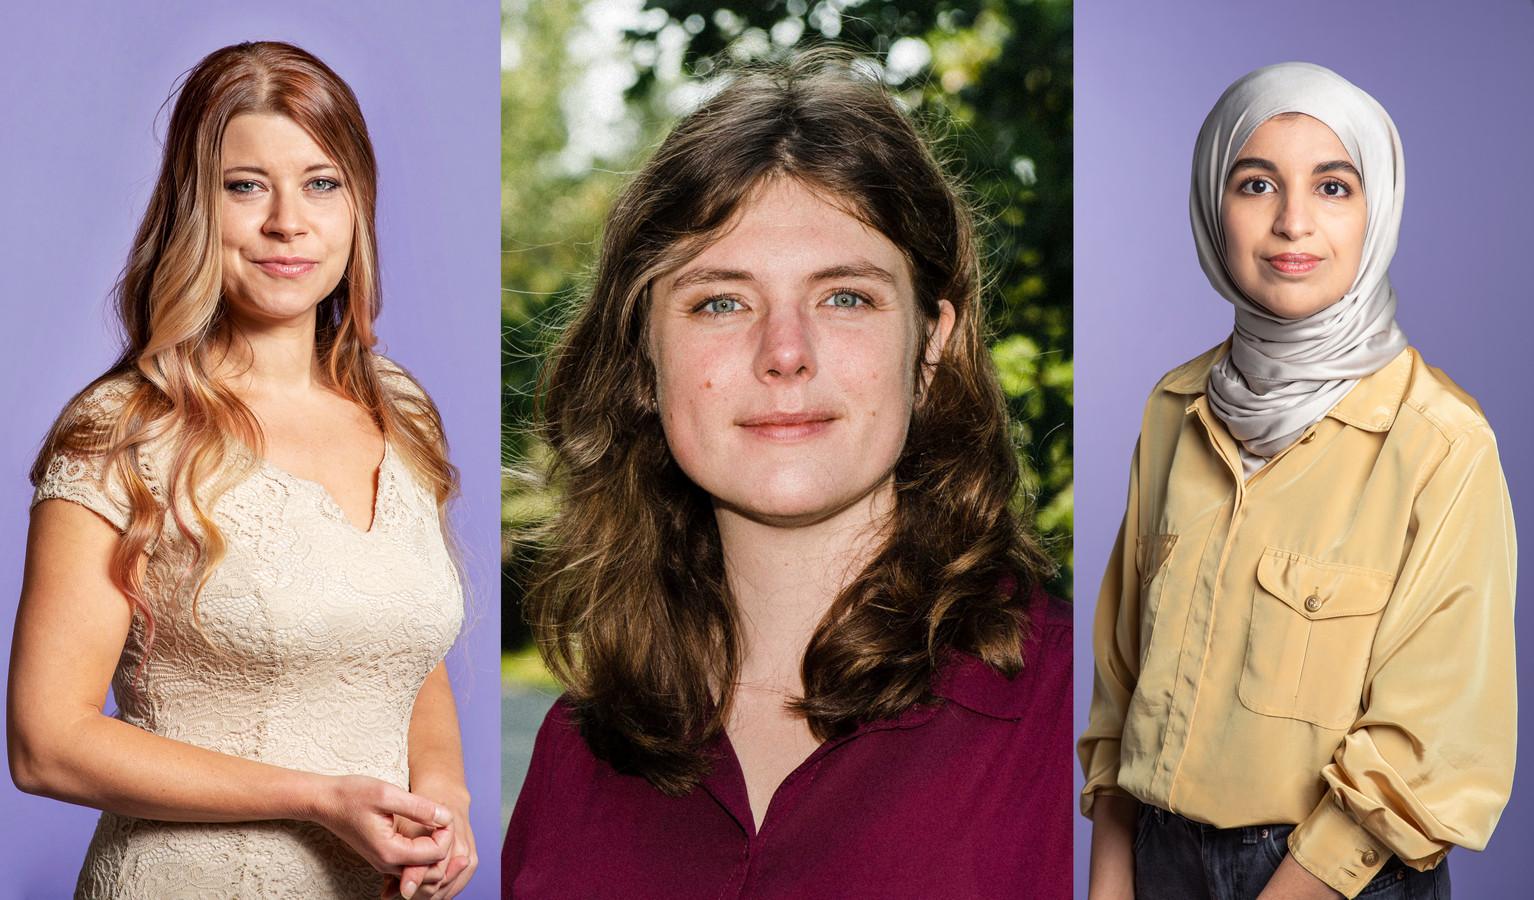 Lisa Westerveld (GroenLinks), Marieke Koekkoek (Volt) en Kauthar Bouchallikht (GroenLinks).